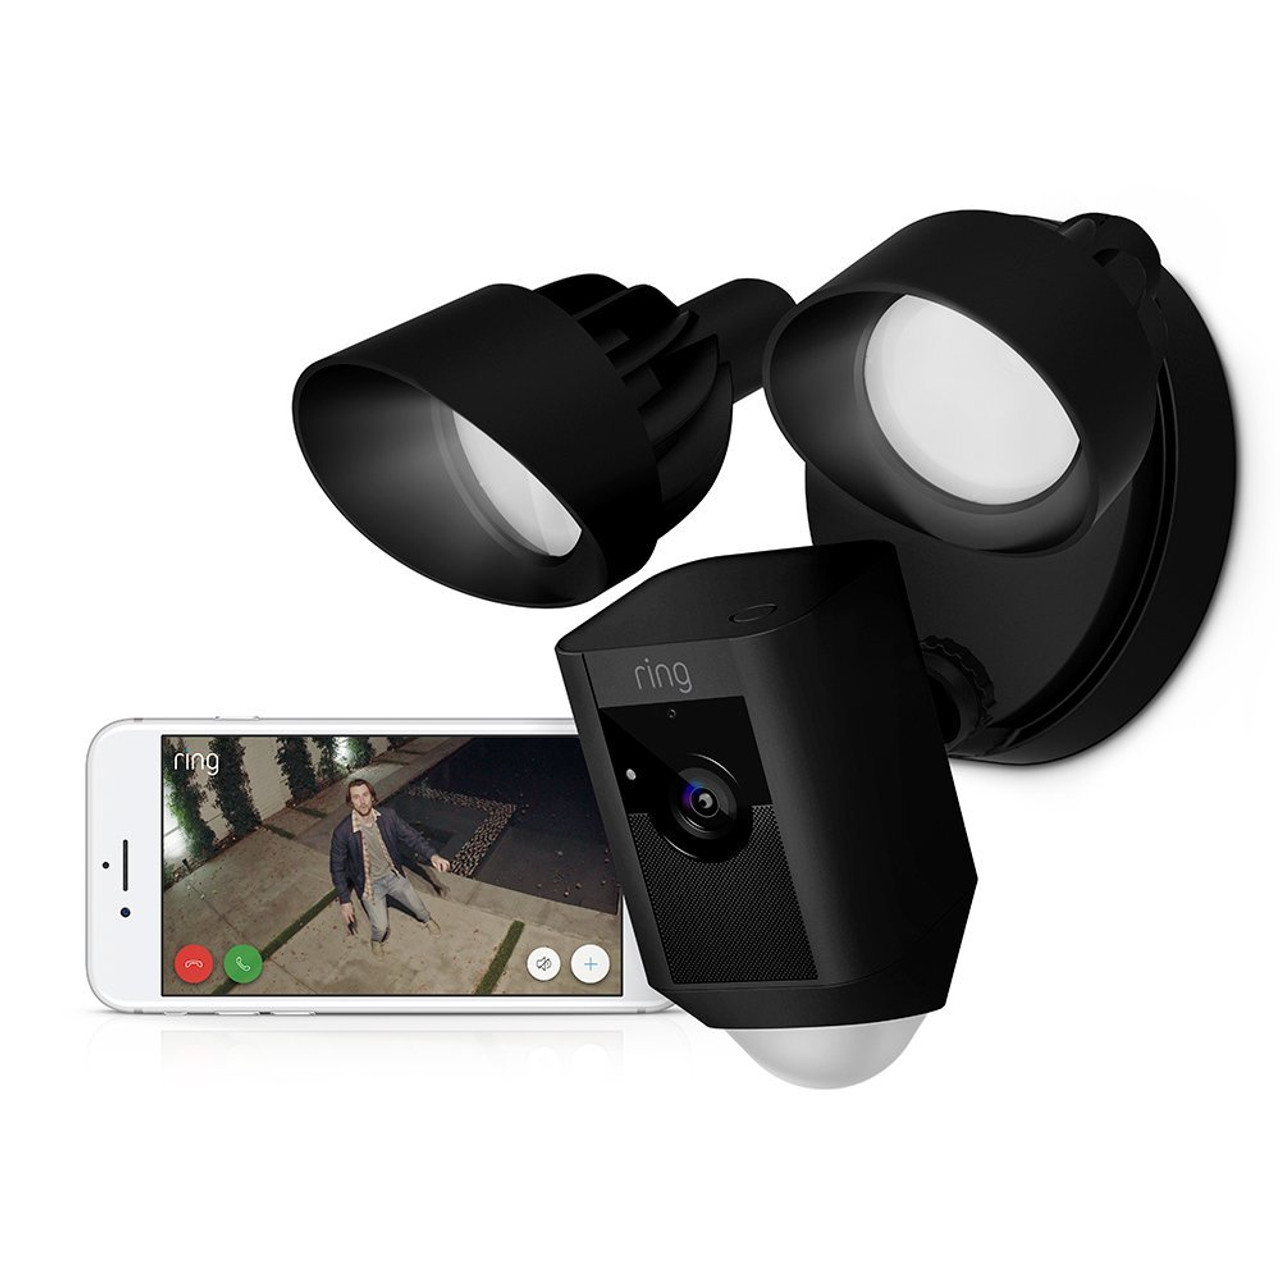 Ring Floodlight Cam in Black Showcasing the Ring App